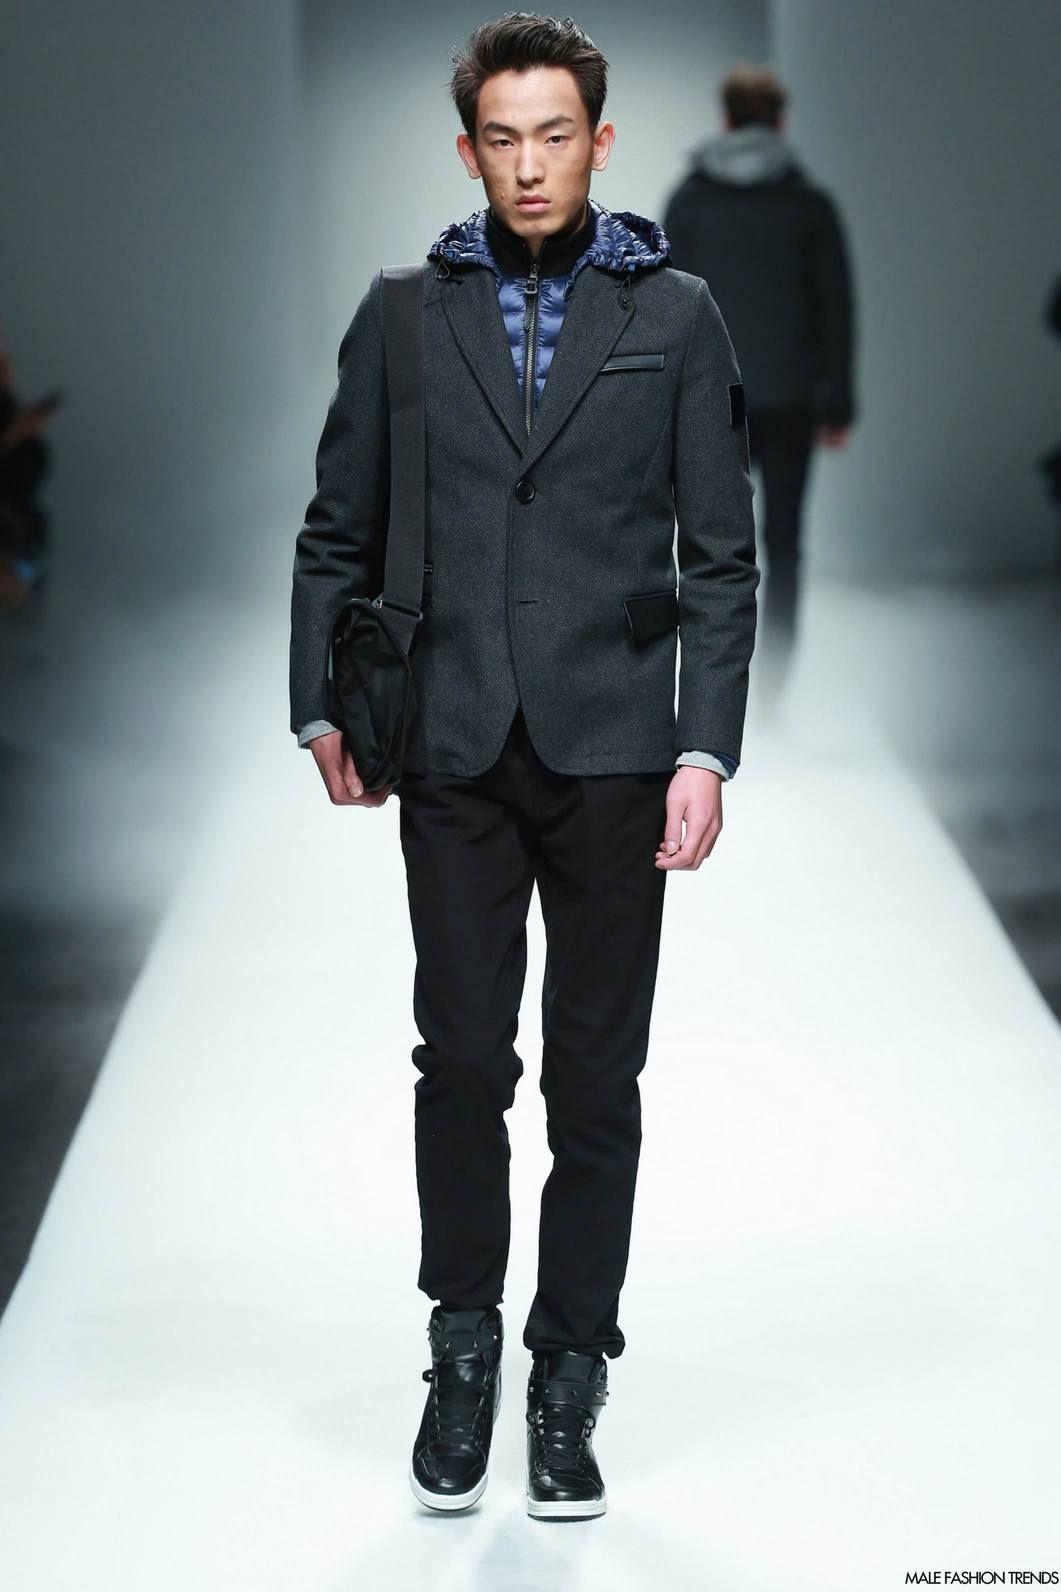 Ricolee Fall/Winter 2016 - Shanghai Fashion Week